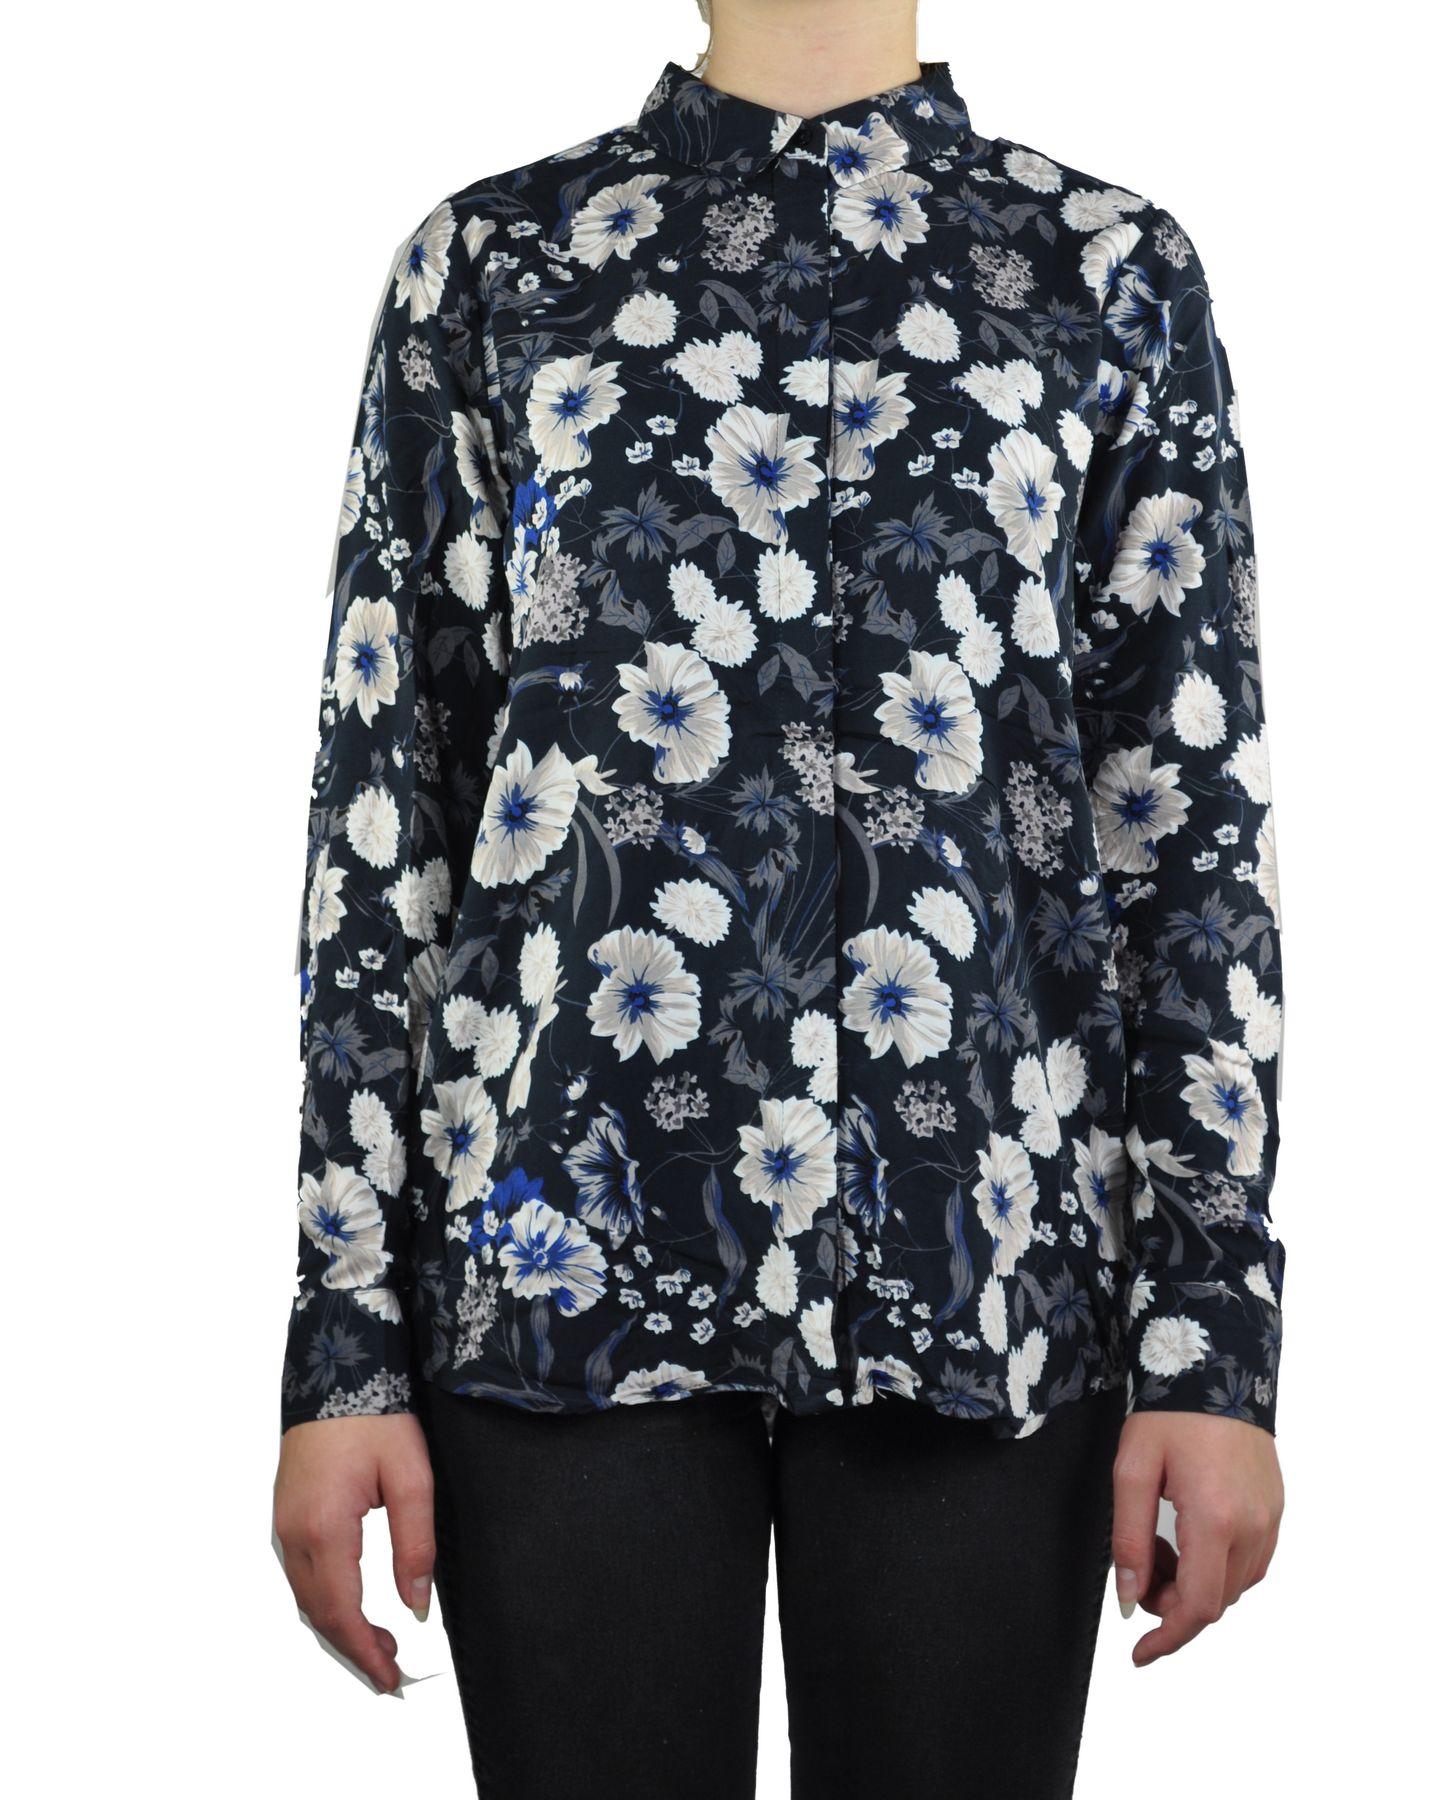 Soyaconcept - Damen Bluse mit Flower Muster, SC-Pammy 2 (14622-30) – Bild 3